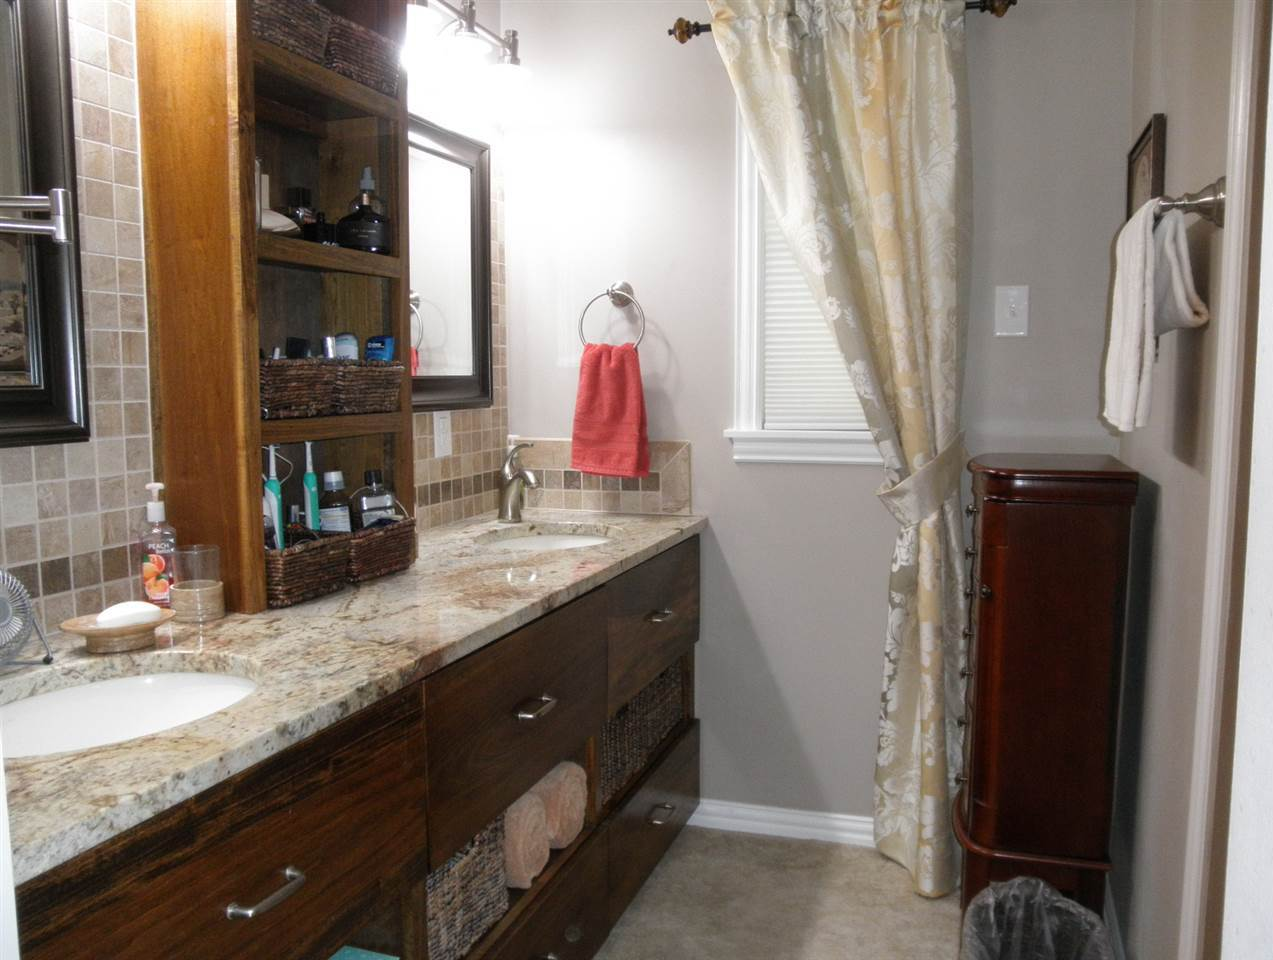 Sold Cross Sale W/ MLS | 127 Fairview  Ponca City, OK 74601 26